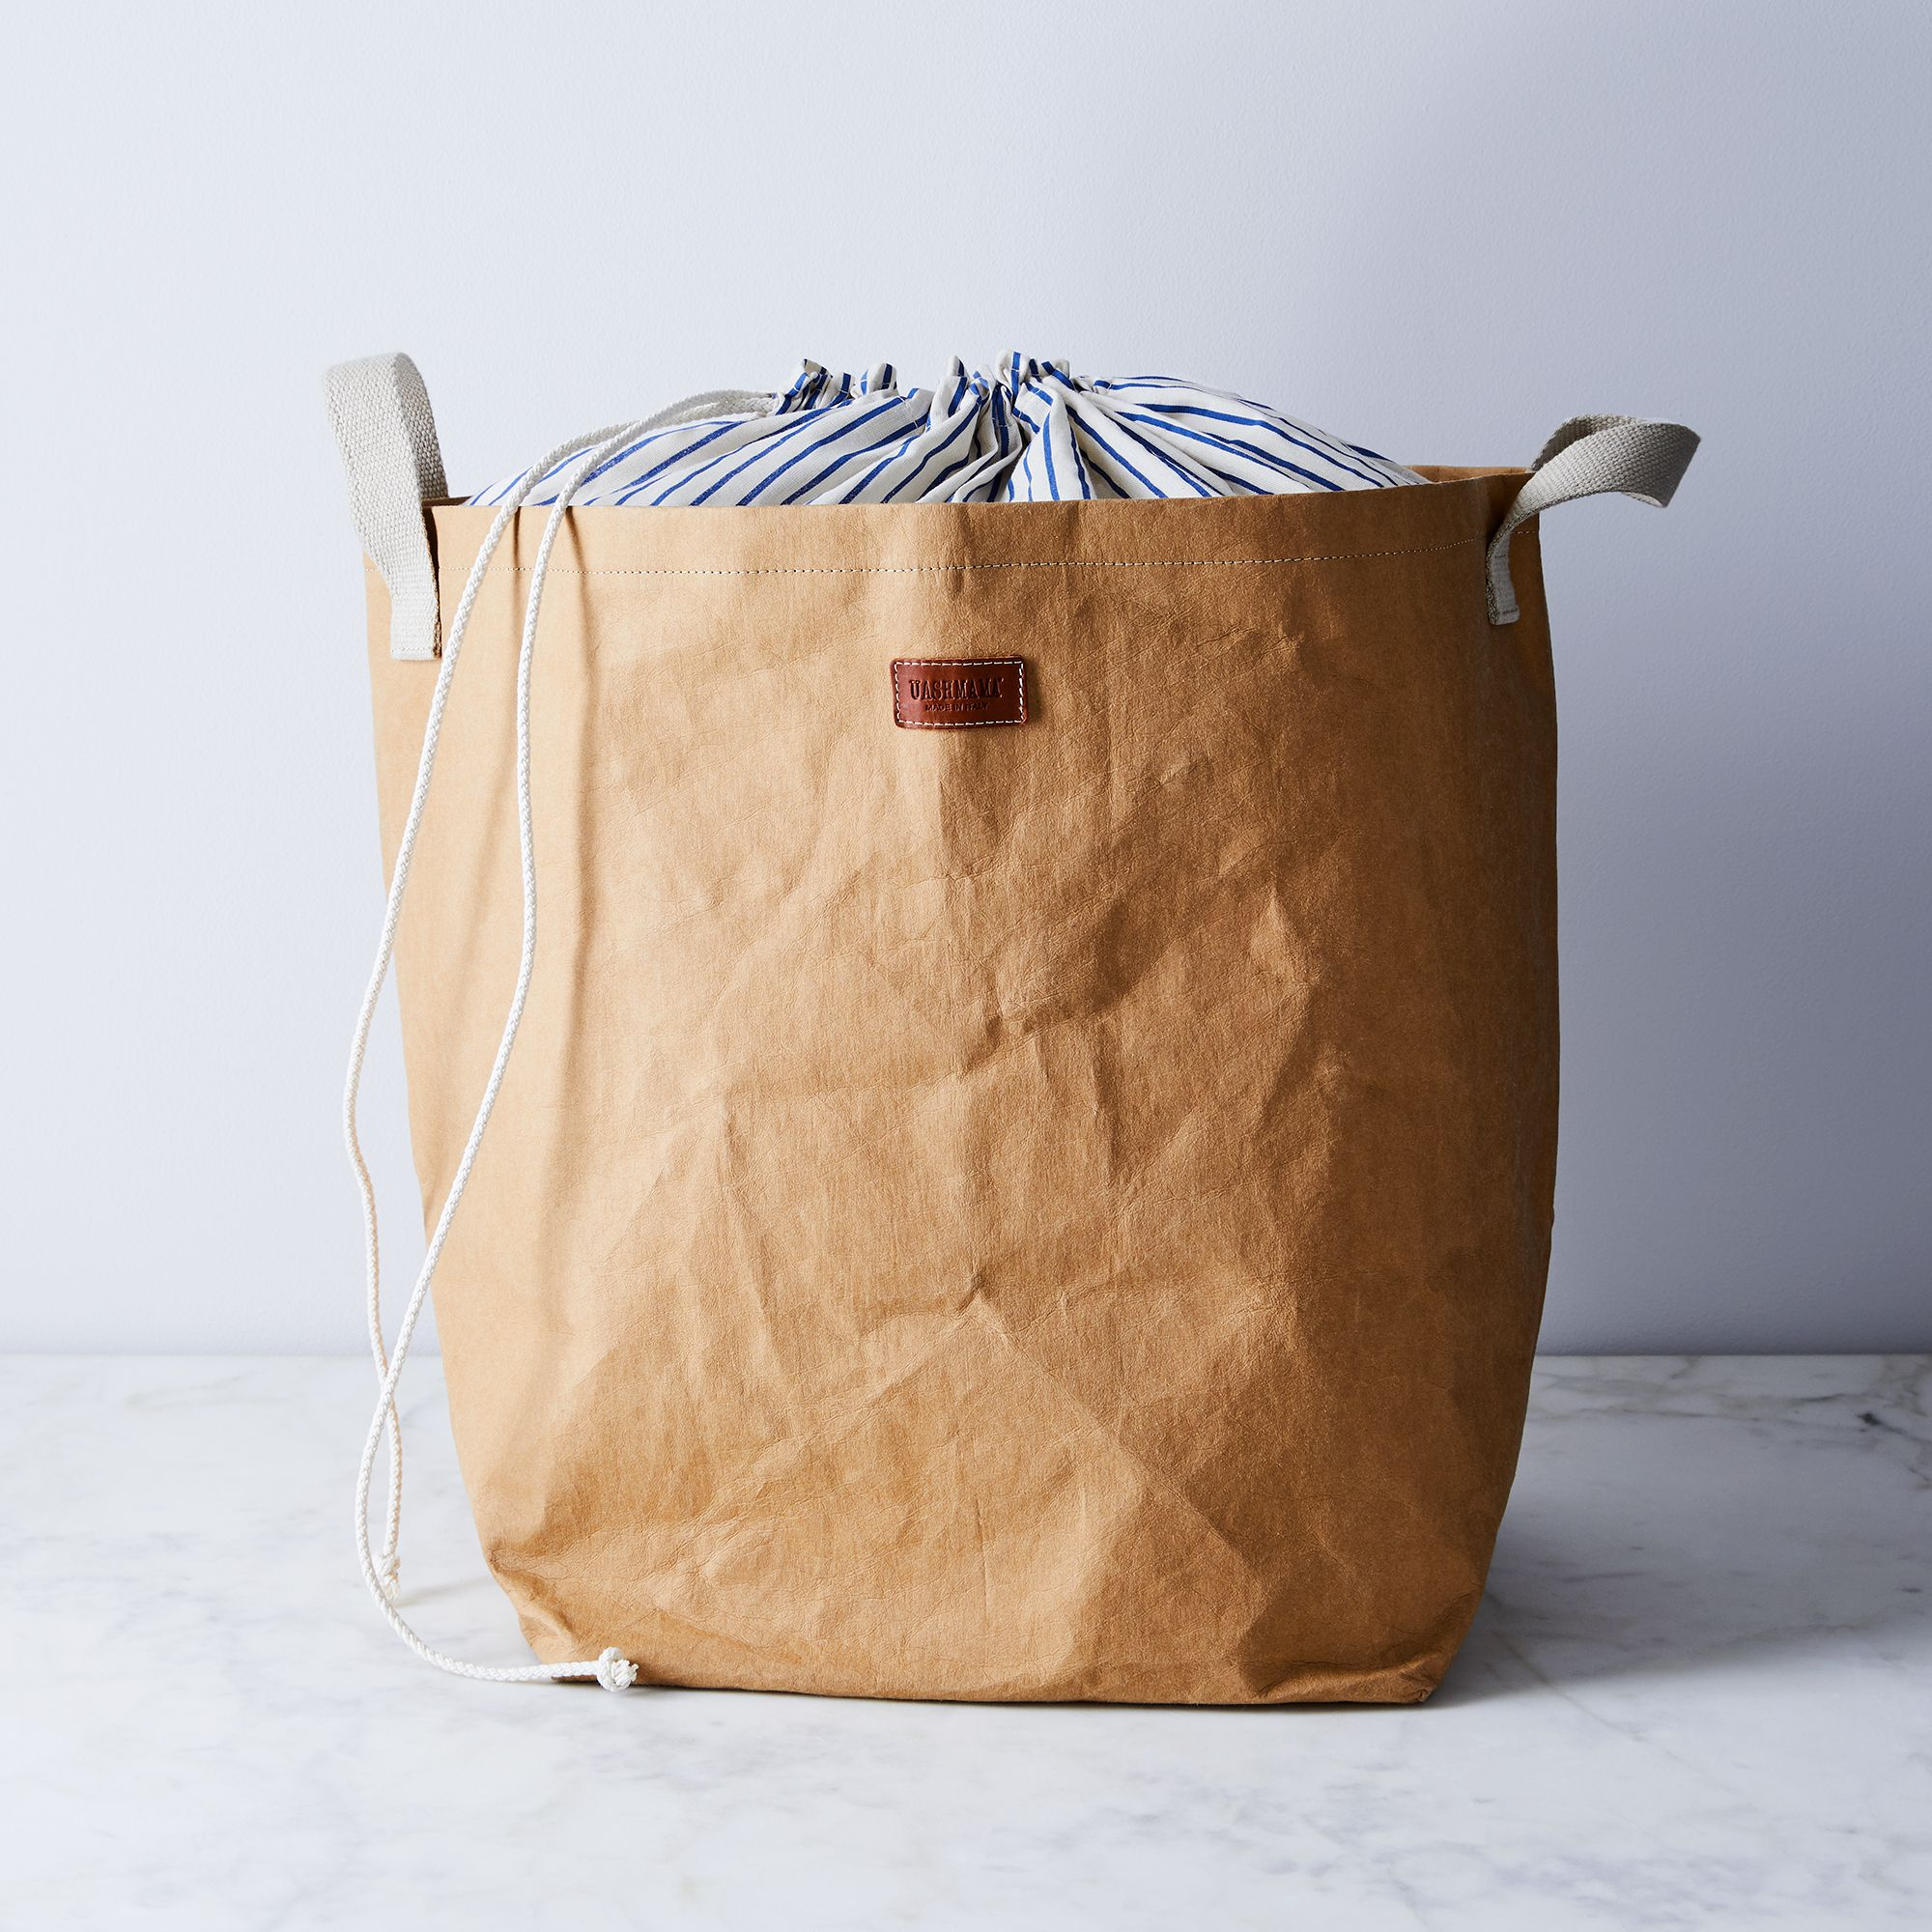 dff3e1b9-66fc-4c1f-ad53-2f0176783818–2018-0227_uashmama_laundry-bag_brown_silo_ty-mecham_006